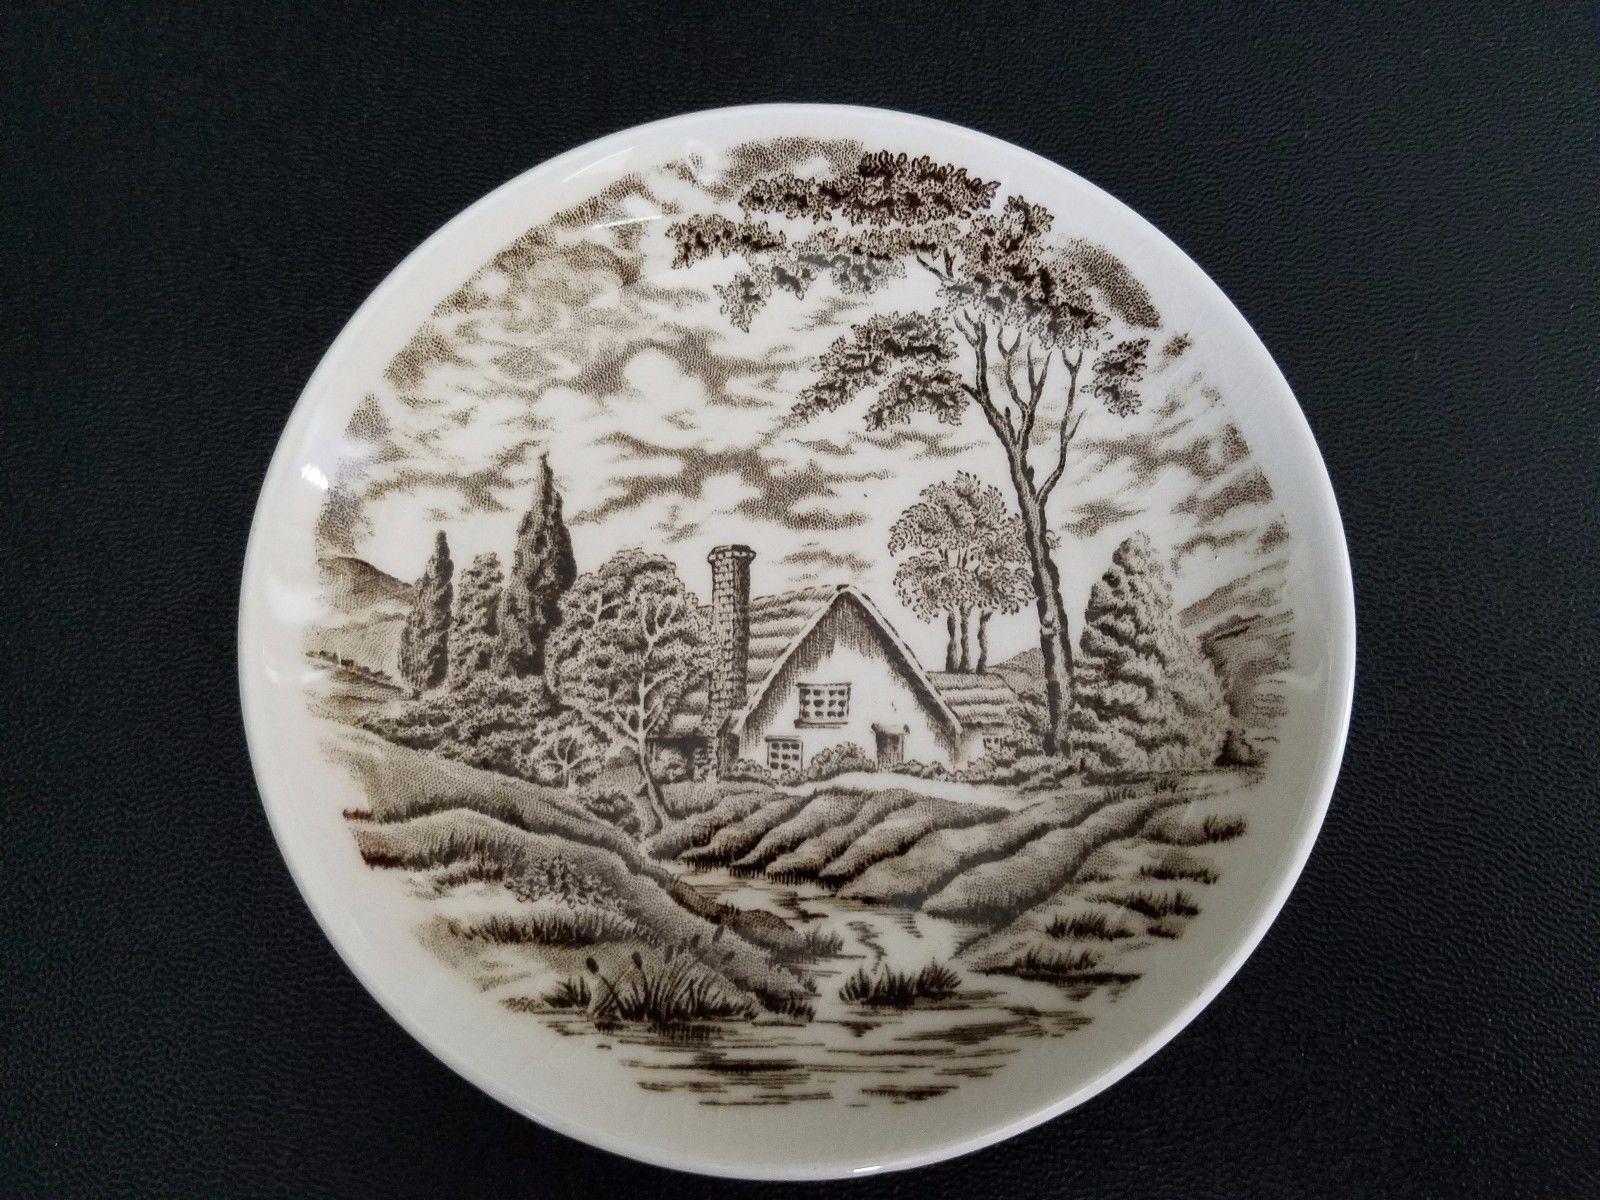 Porcelain dish with miniature woodland